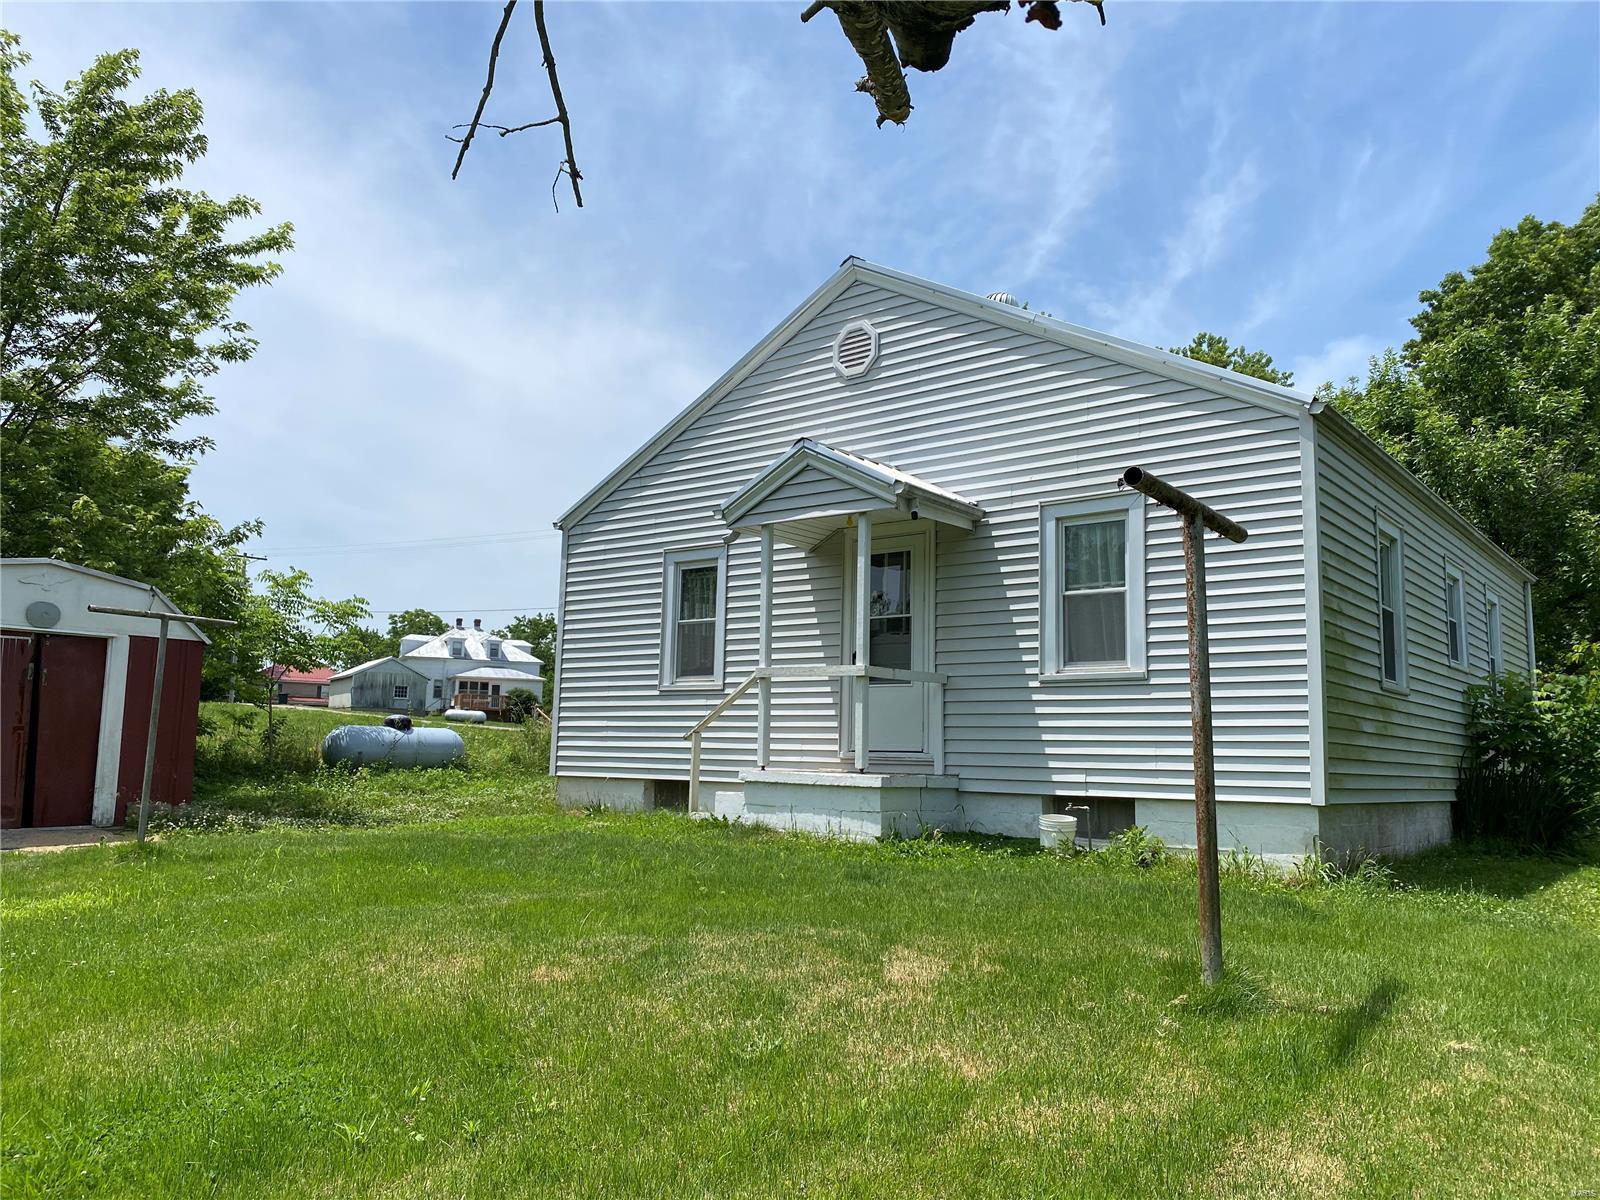 422 Pine Property Photo - Morrison, MO real estate listing